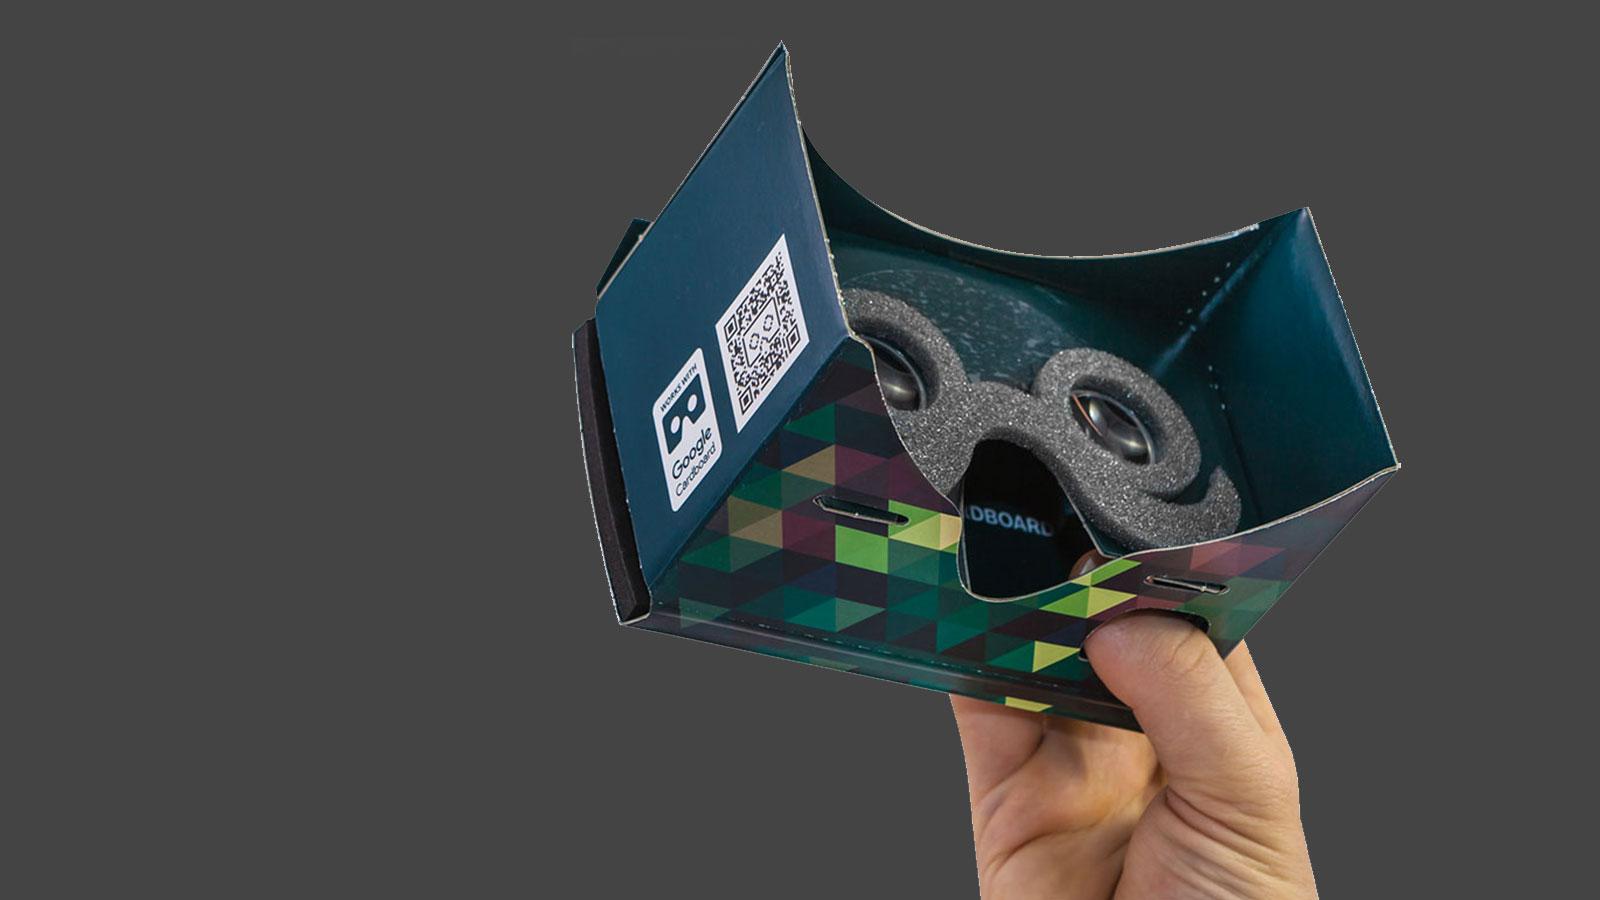 google-cardboard-pop-cardboard-3.0-thumb-cut-out